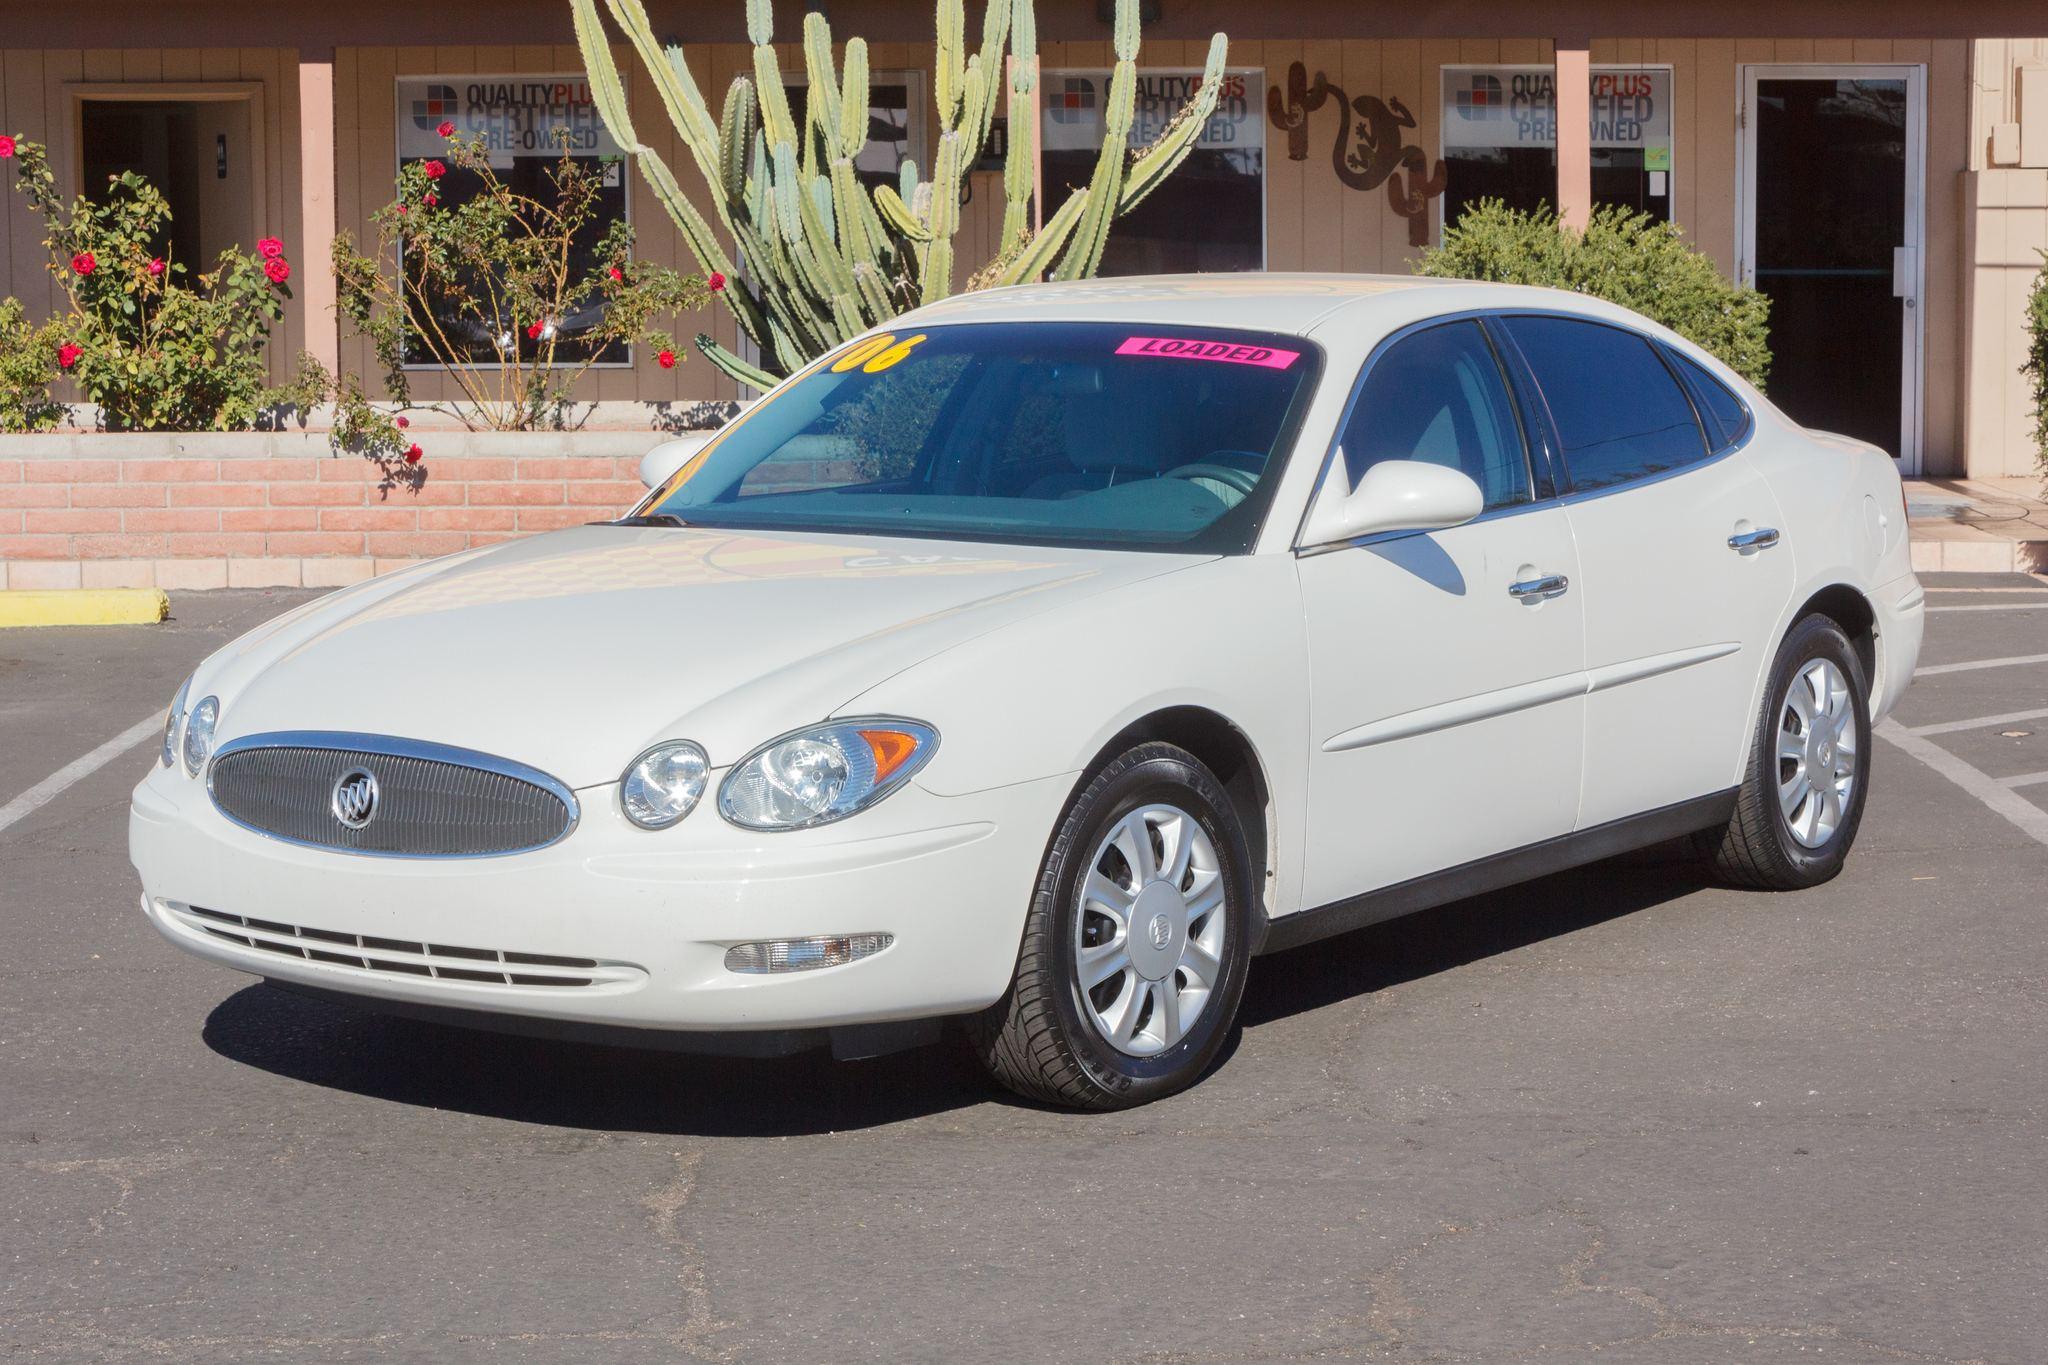 Photo of 2006 Buick LaCrosse 4d Sedan CX White Opal